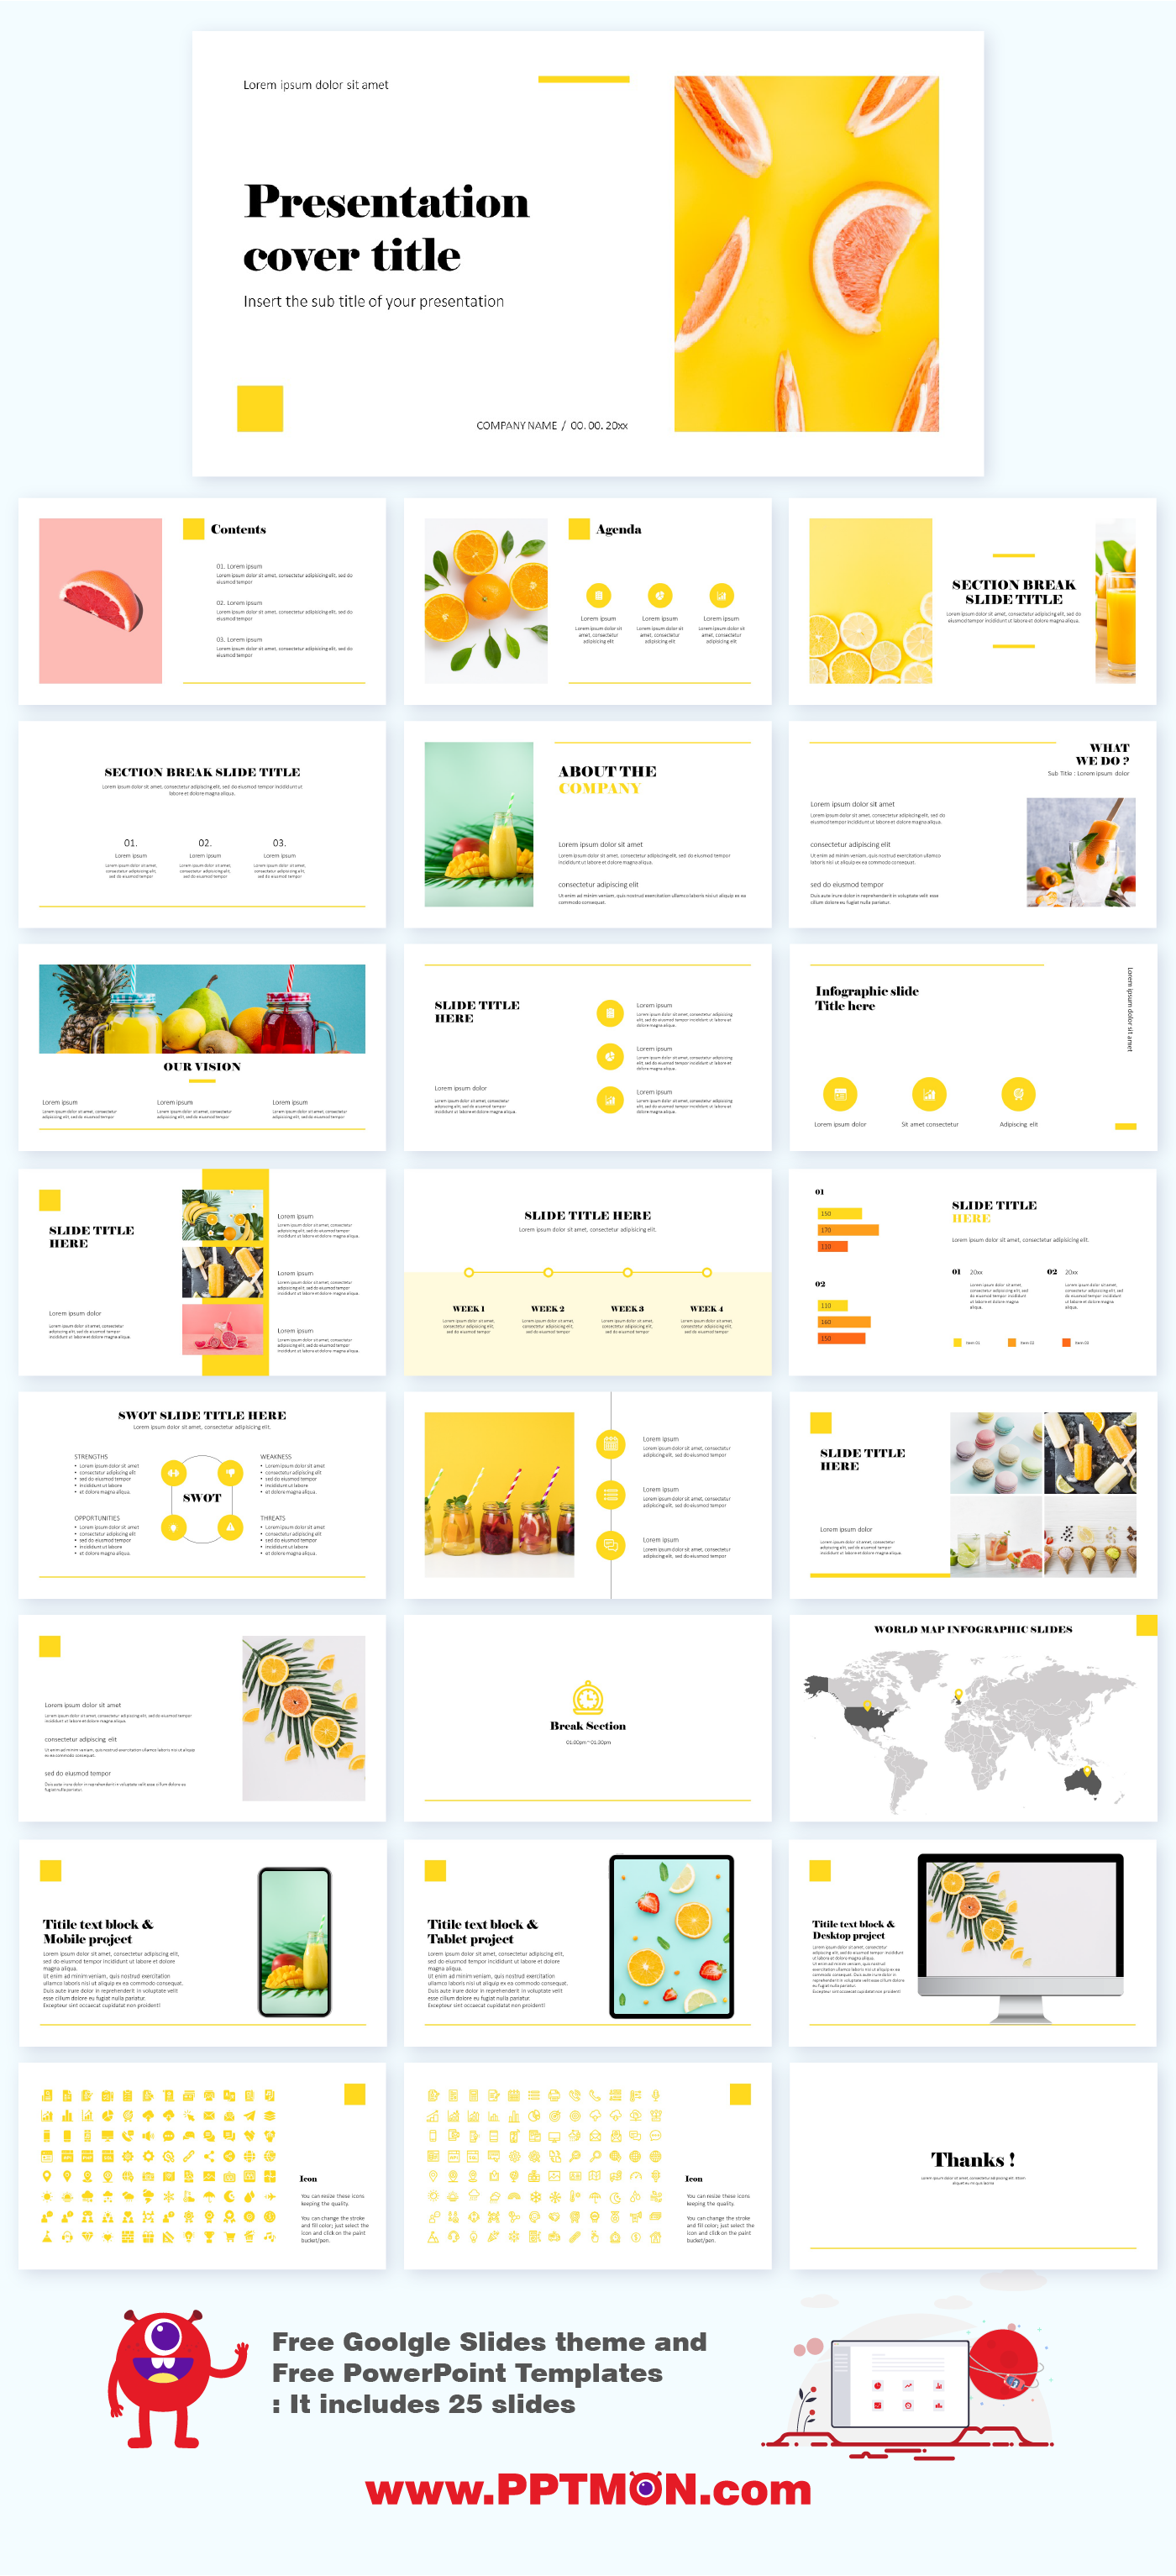 Minimal Slide Presentation Templates Free Google Slides Theme And Pow In 2020 Presentation Slides Templates Presentation Template Free Free Powerpoint Presentations